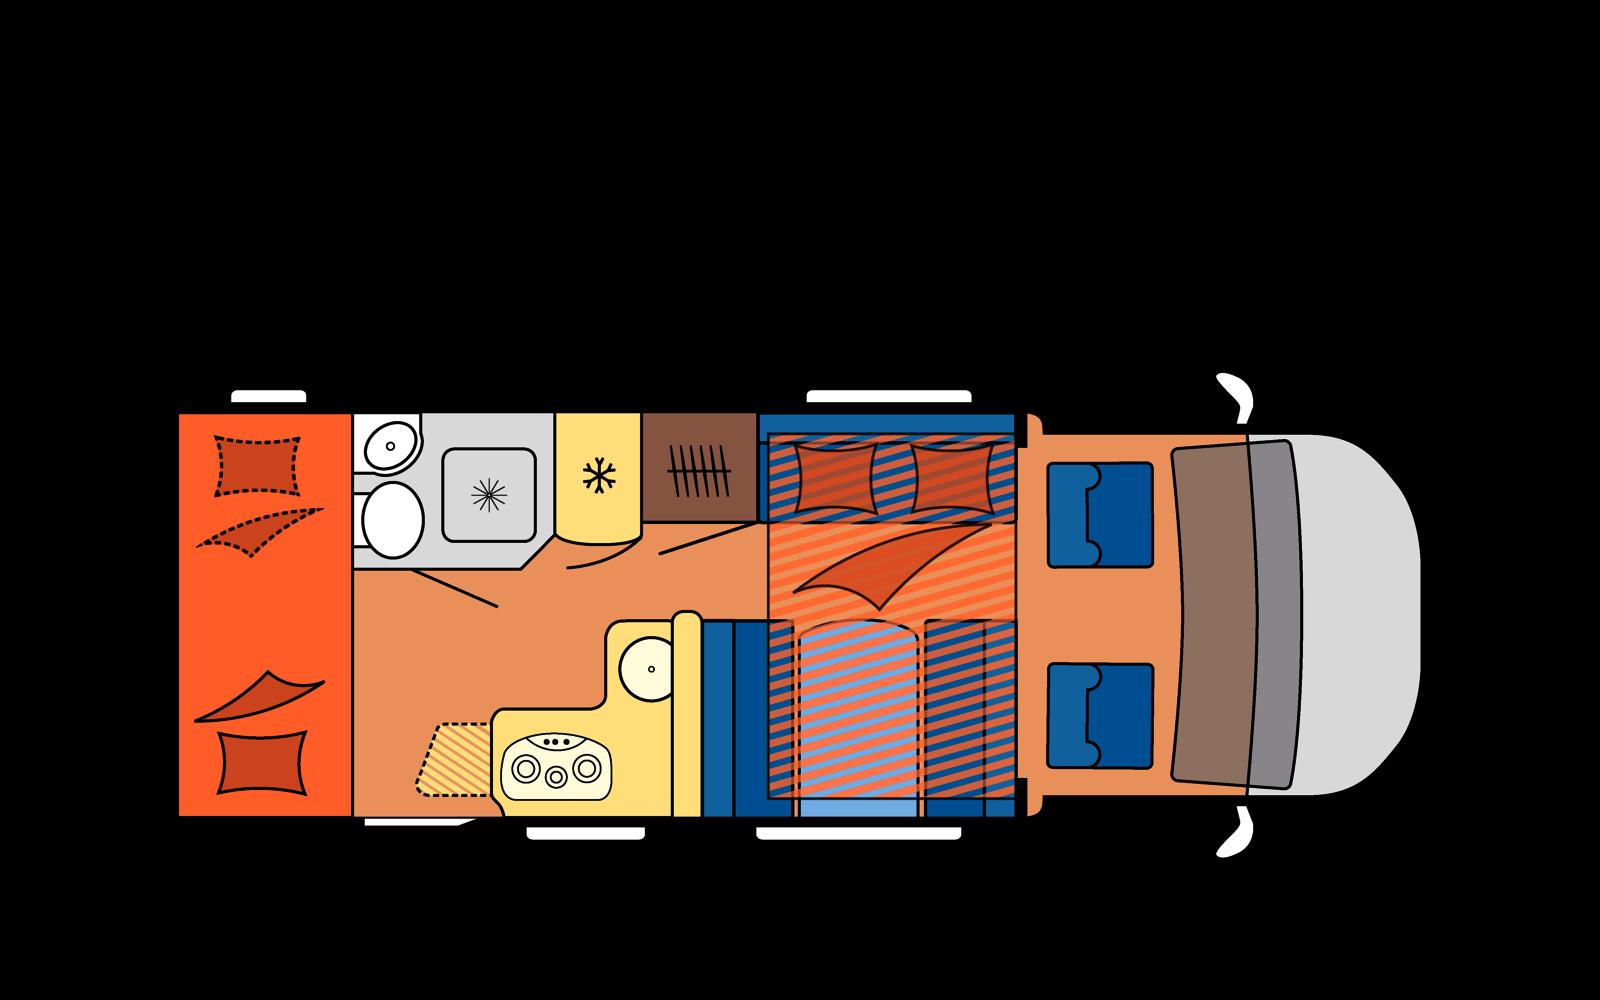 Optima T65 HKM